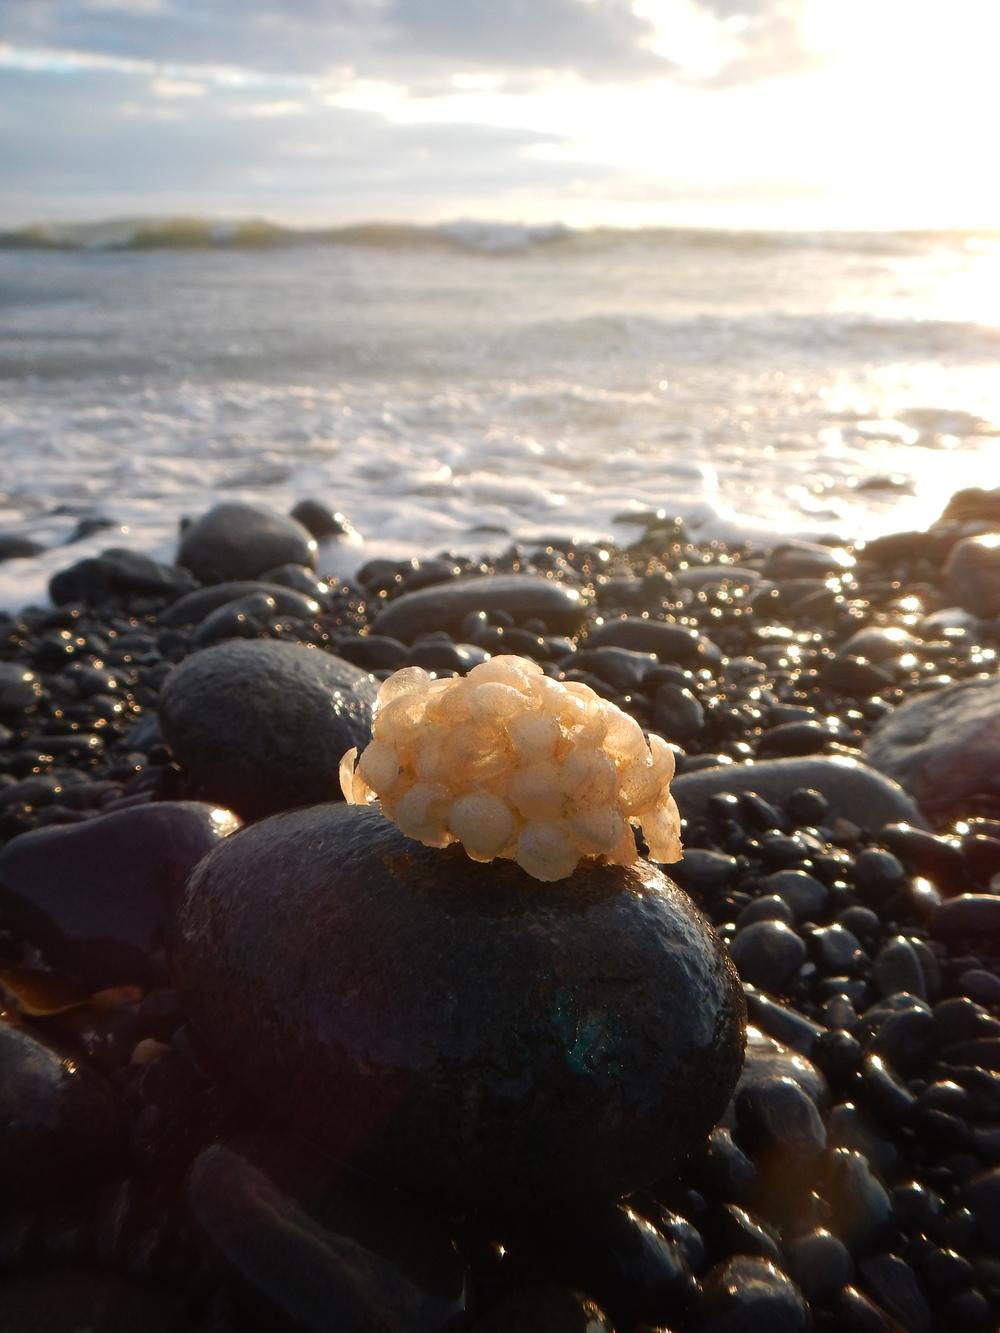 Ocean treasures.